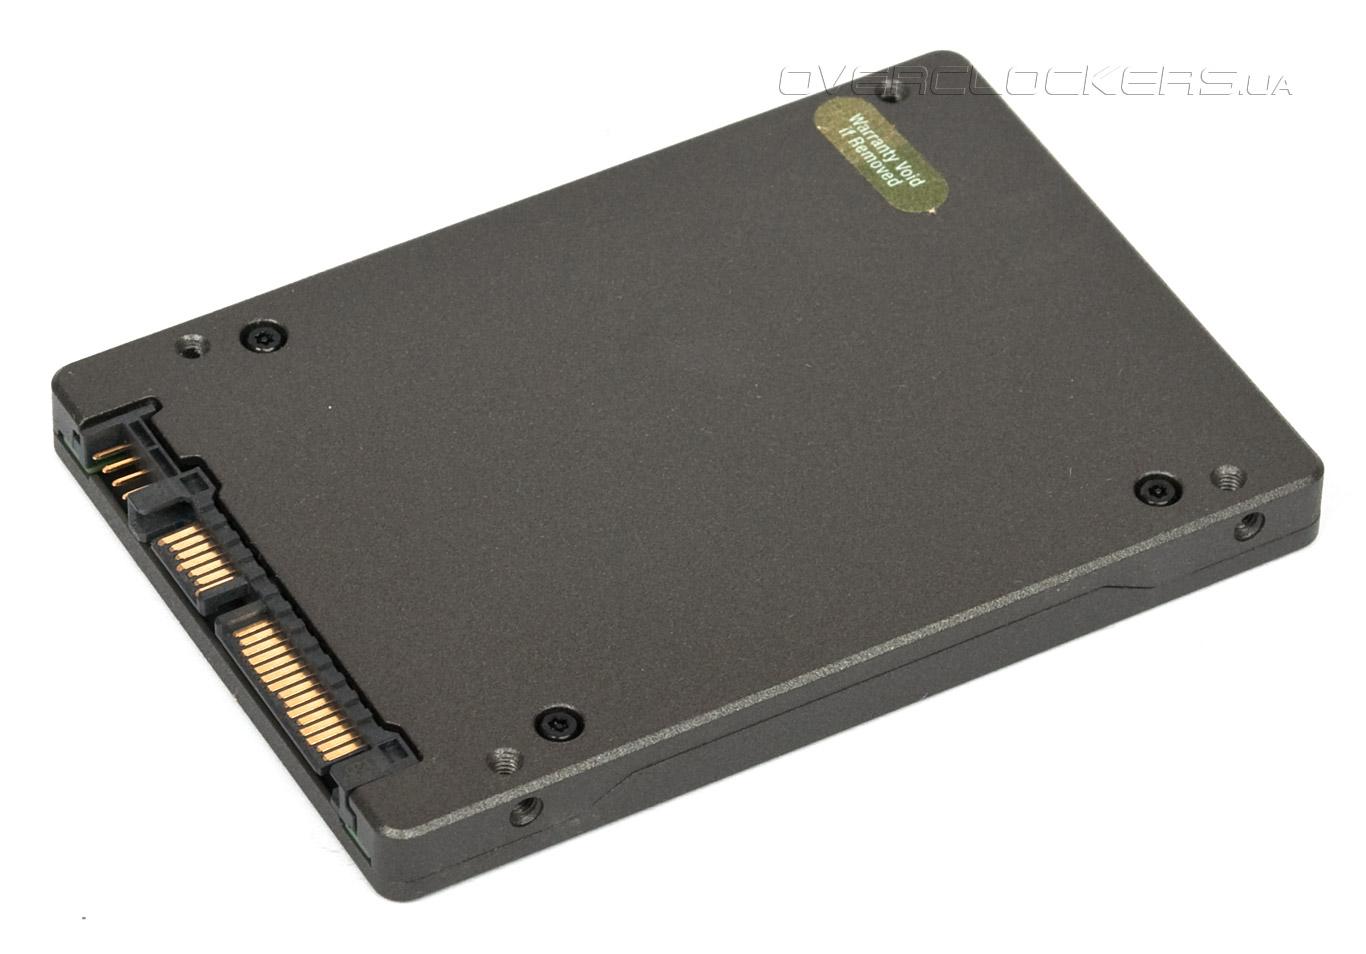 KINGSTON SKC100S3B120G SSD DRIVER FOR WINDOWS DOWNLOAD